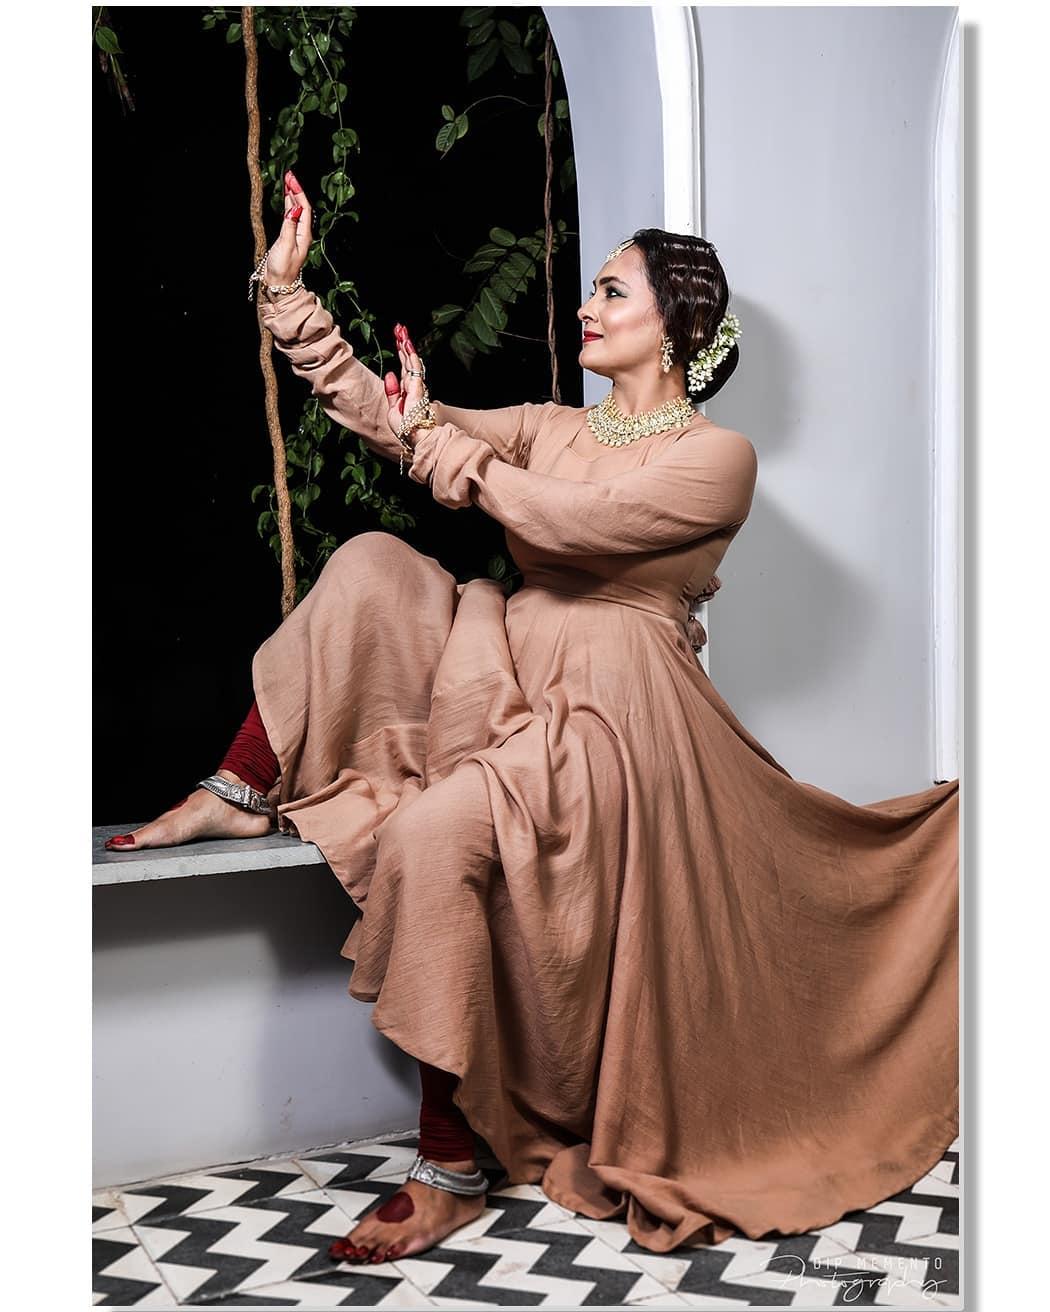 """The job of feets is walking, but their hobby is dancing."" Shoot for Song: Chalte Chalte/ Nupoor khedkar feat.(Pakeezah)  Jewellery: @vrudevjewelsa Wardrobe: @rajparihardesigner  Performers:  Performers: @jashodapatel_kathak @bhuvneshwaripatel @kashish_patel18 Photo/Video: @dip_memento_photography @meandmyphotography11 Makeup: Krishna Bhati  #dipmementophotography #kathak #kathakdance #classicaldance #ahmedabad #indianclassicaldance #pirouettes #chakkars #happydancing #classicaldance #indiandancer #dancersofinstagram #indianclassicaldance #dancerslife #classicaldancers #kathakdance #kathakdancer #indianclassicaldancers #9924227745 #spins #lovefordance #worldofdance #dance #indiandanceform #music #loveforkathak #dancers #dancersindia #chlteChaltesong #LataMangeshkar #Kathak #Pakeezah"